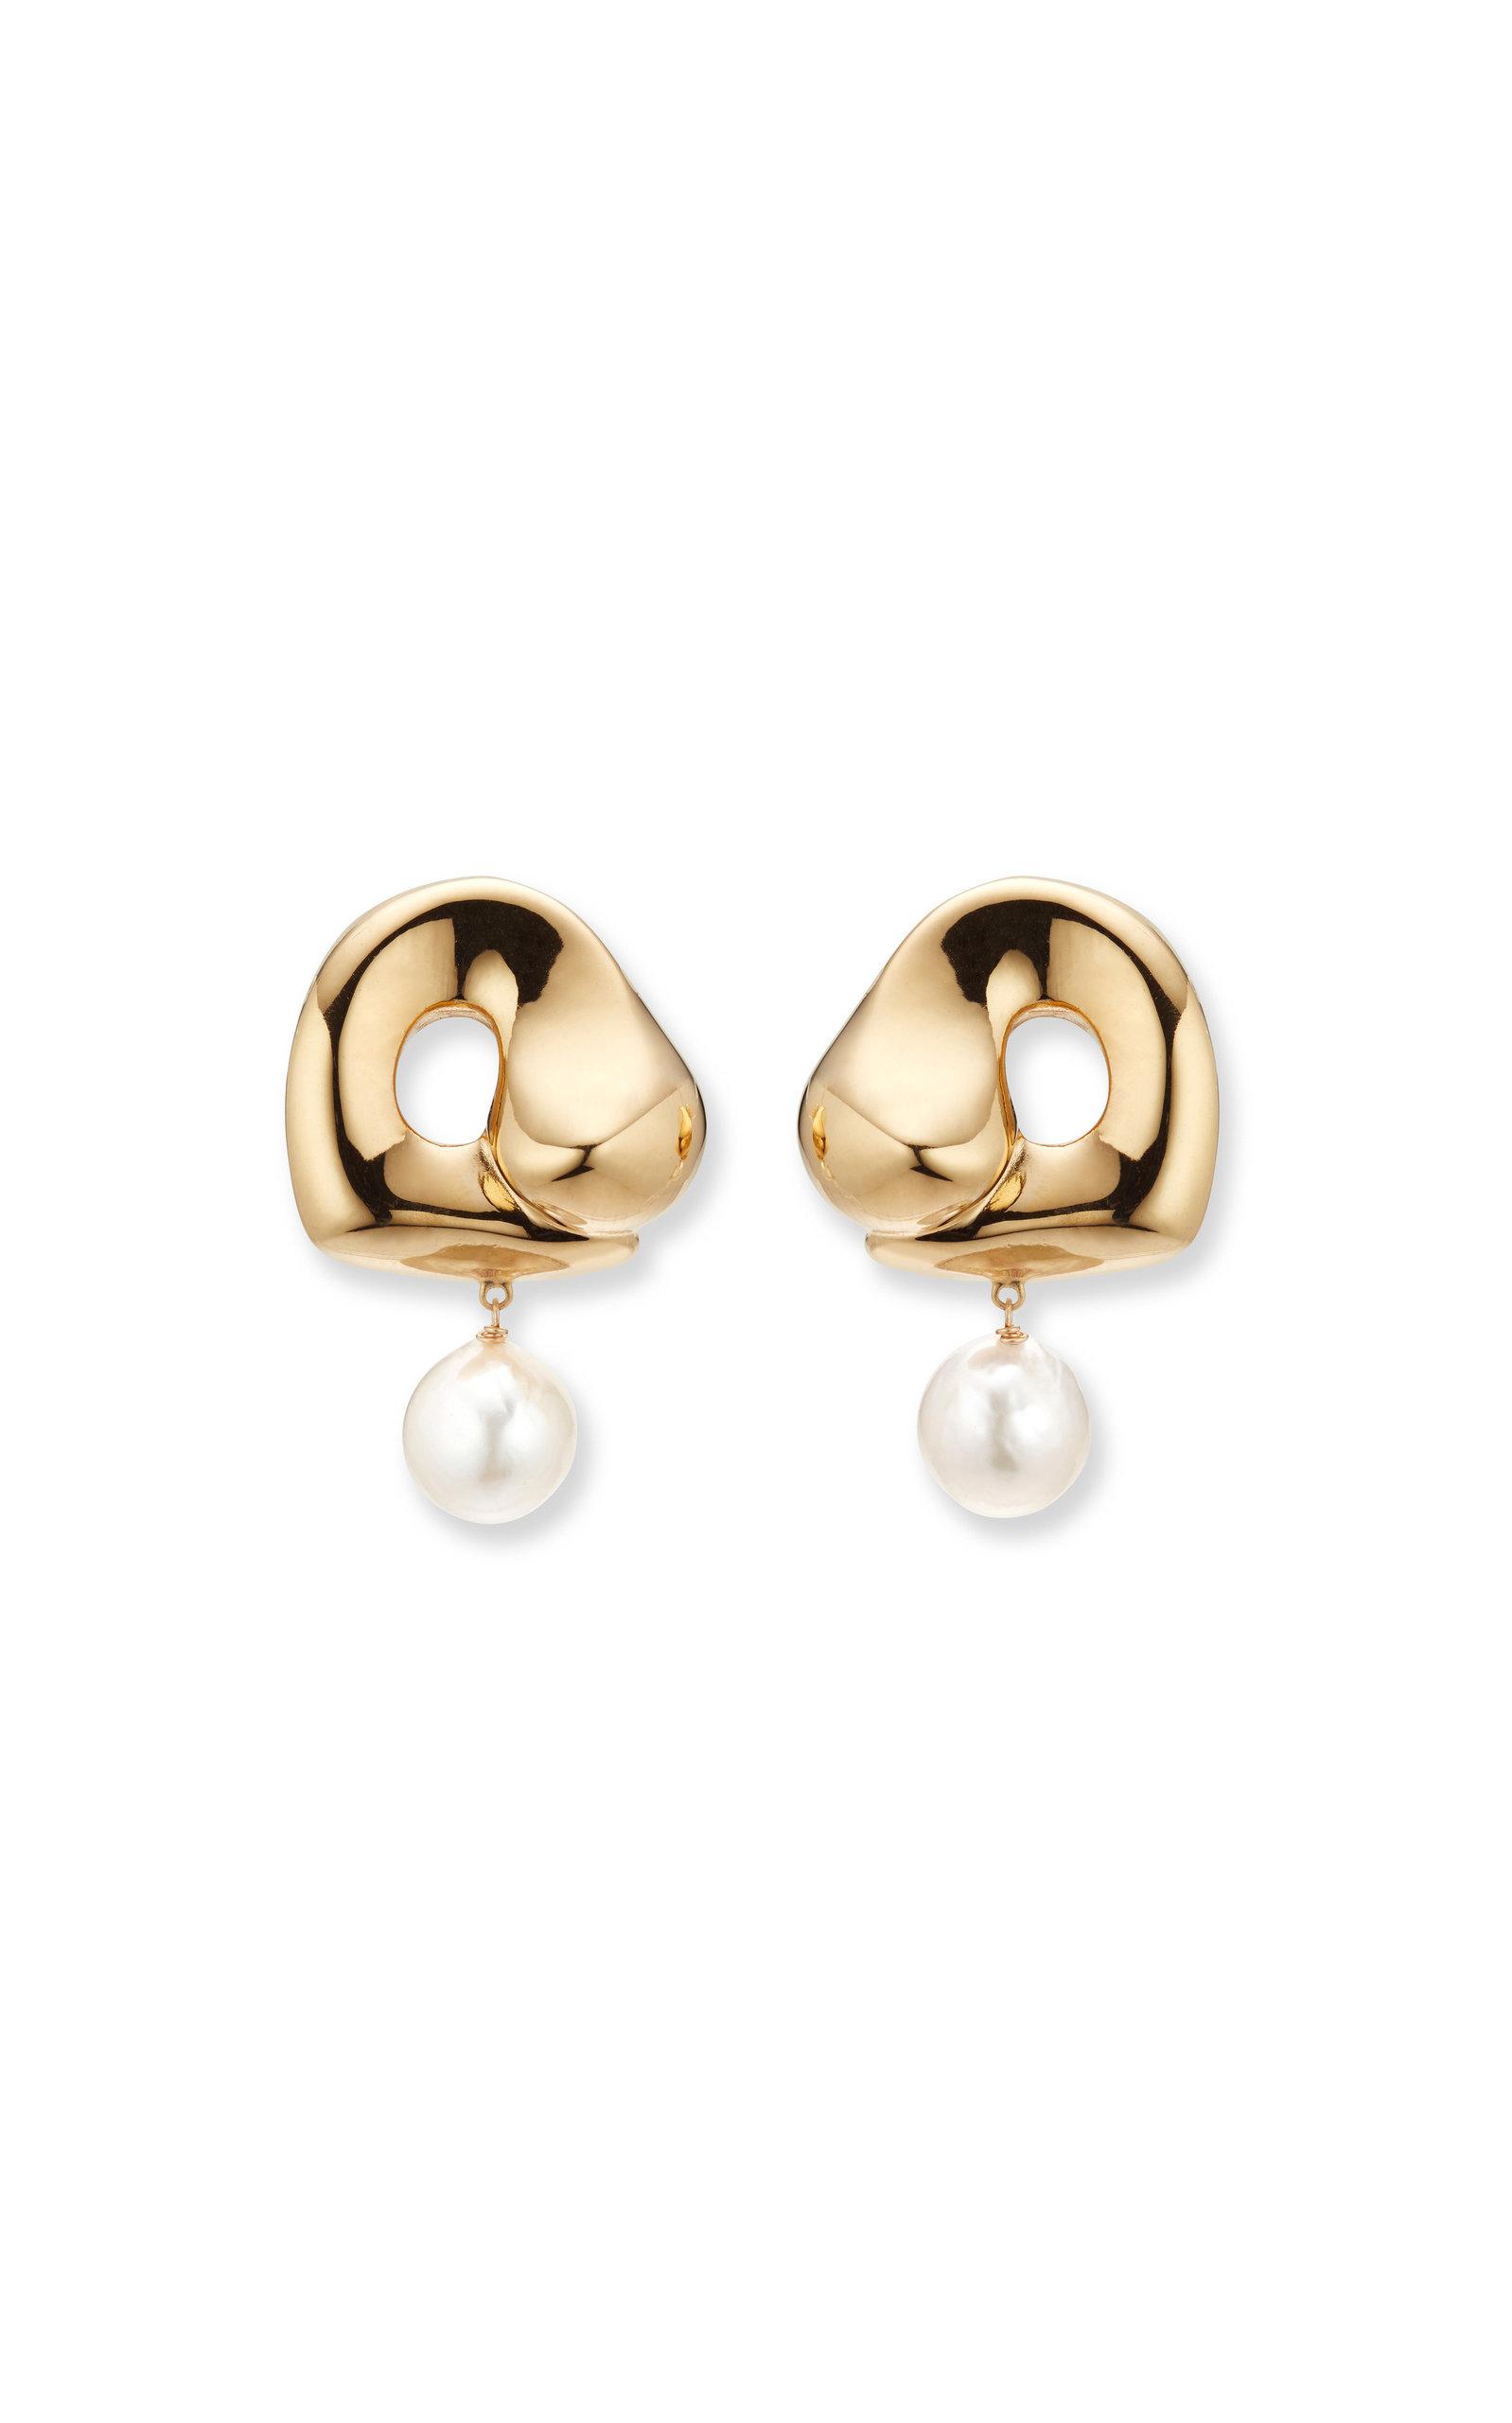 Women's x Simone Bodmer-Turner Sandra 18K Gold Vermeil Pearl Earrings